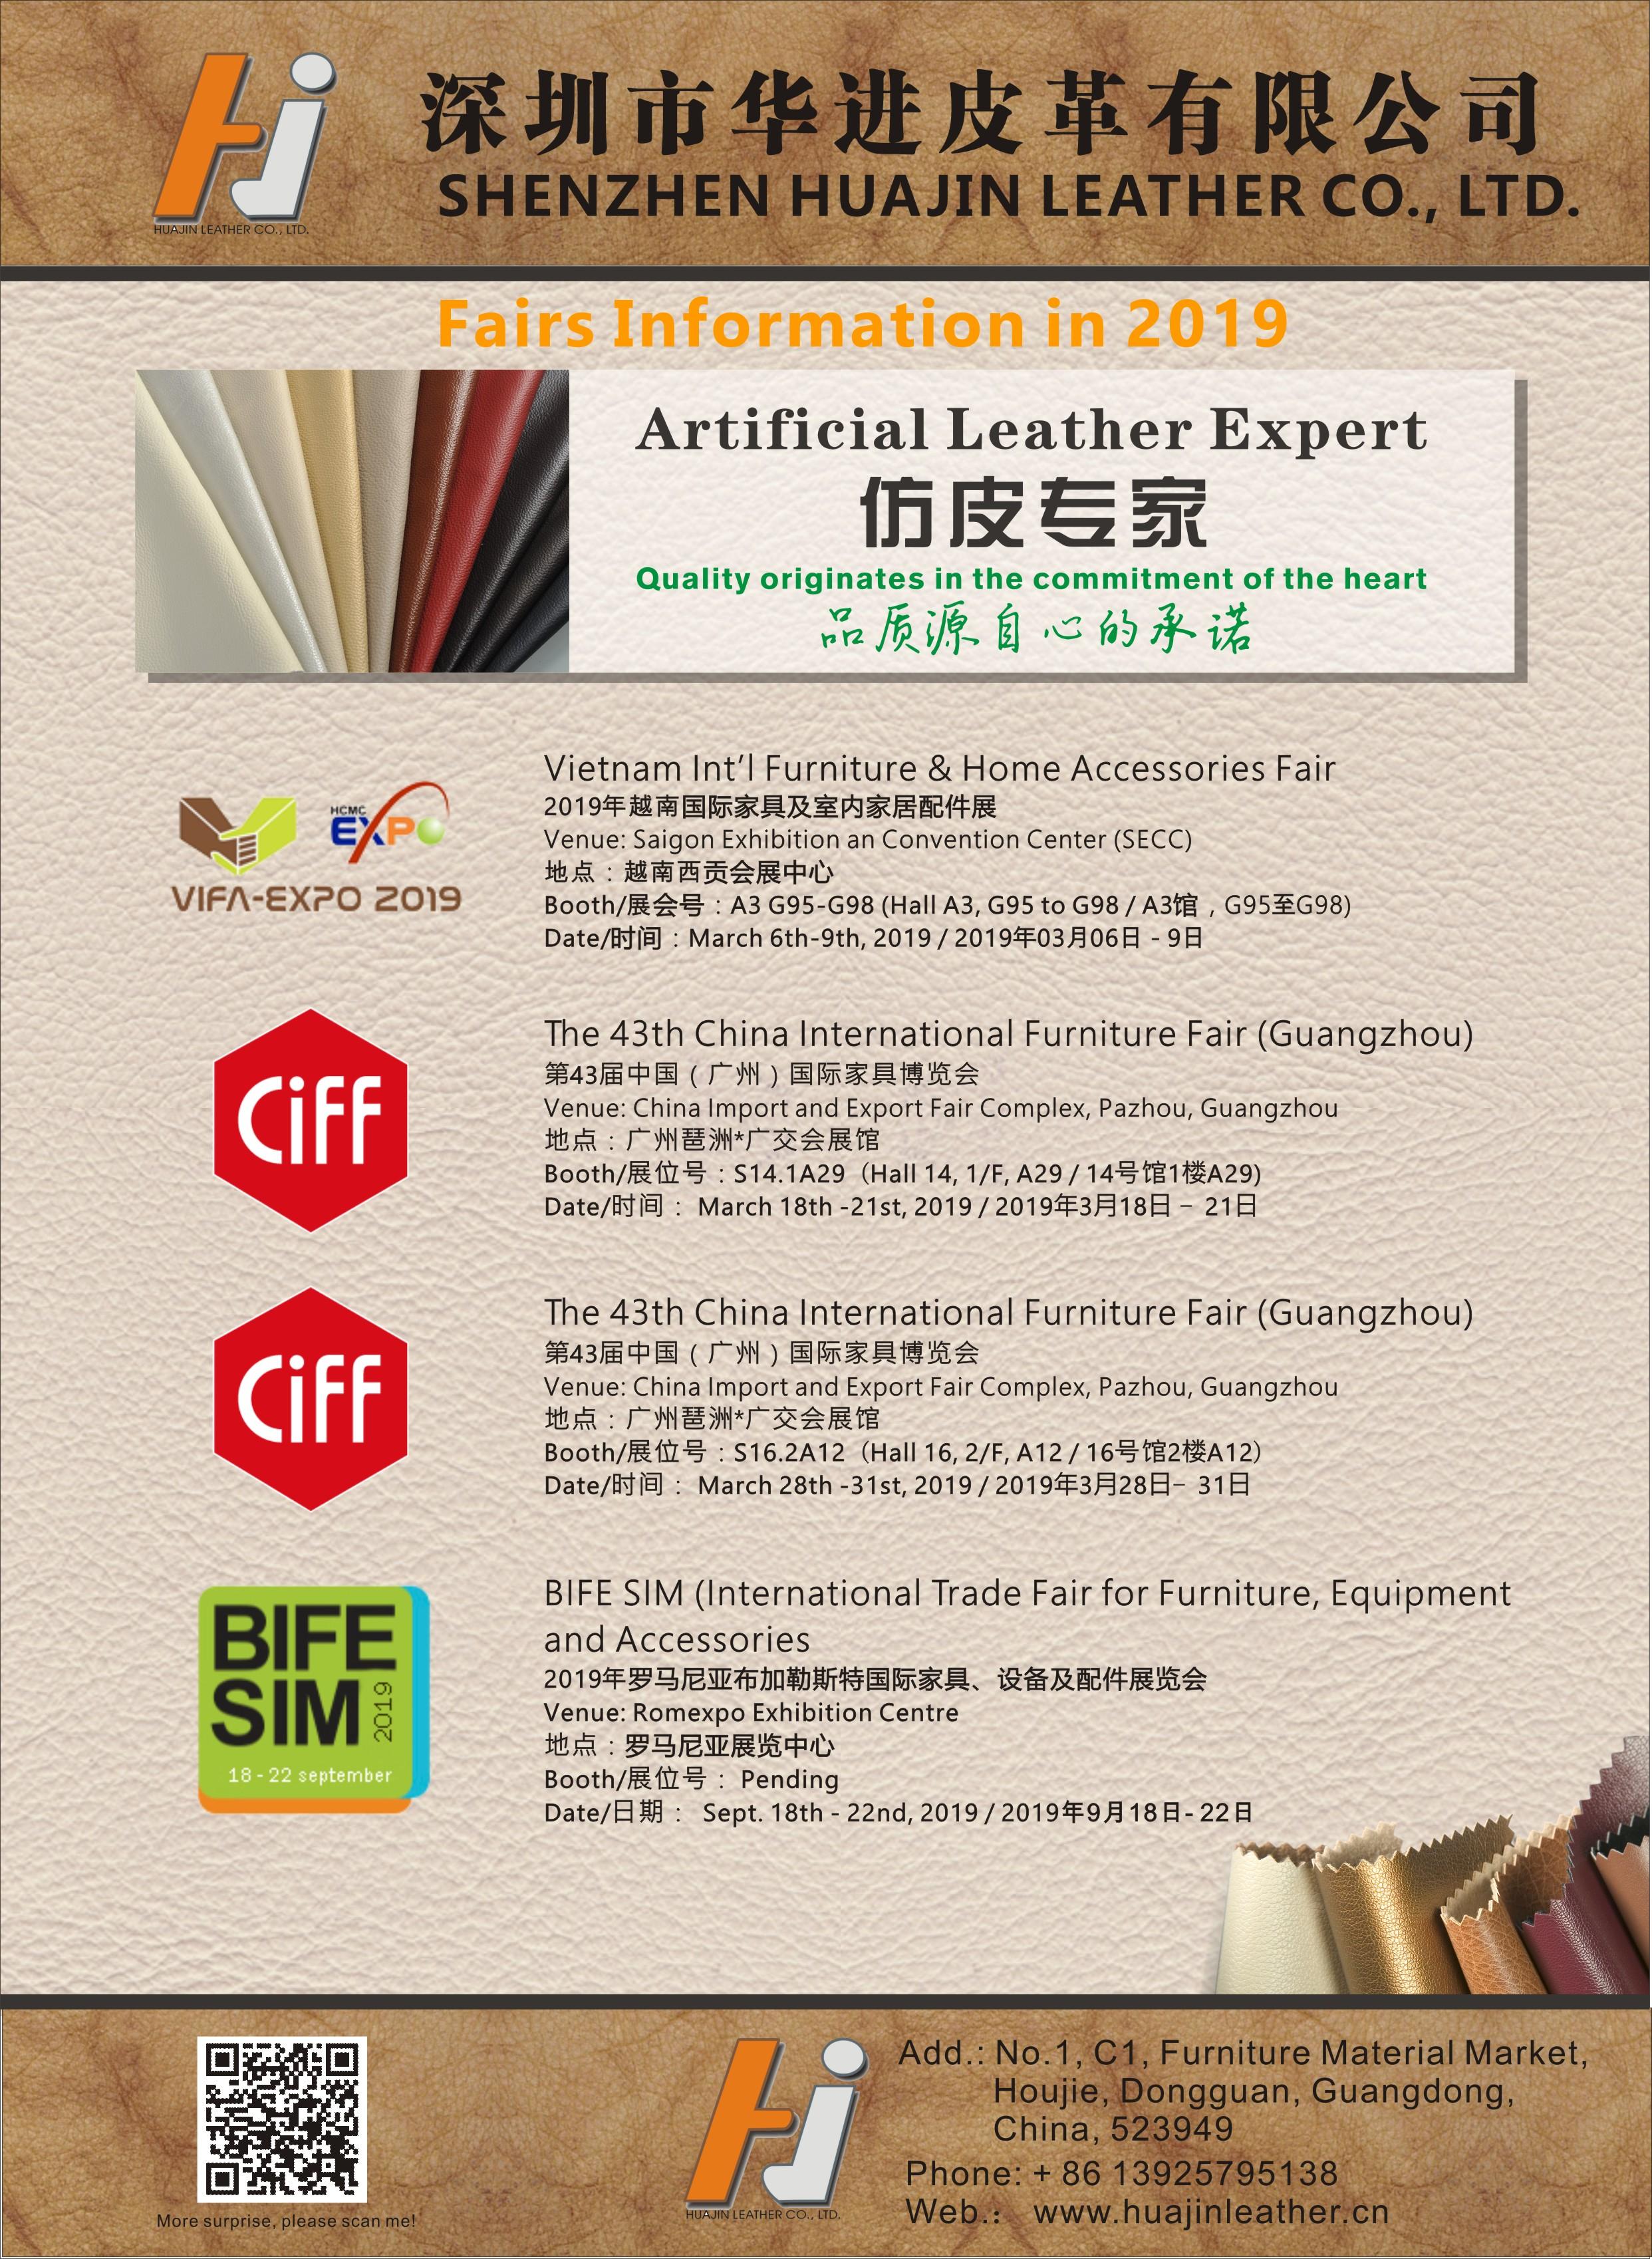 uploads/huajin-leather.com/images/15502189673088.jpg